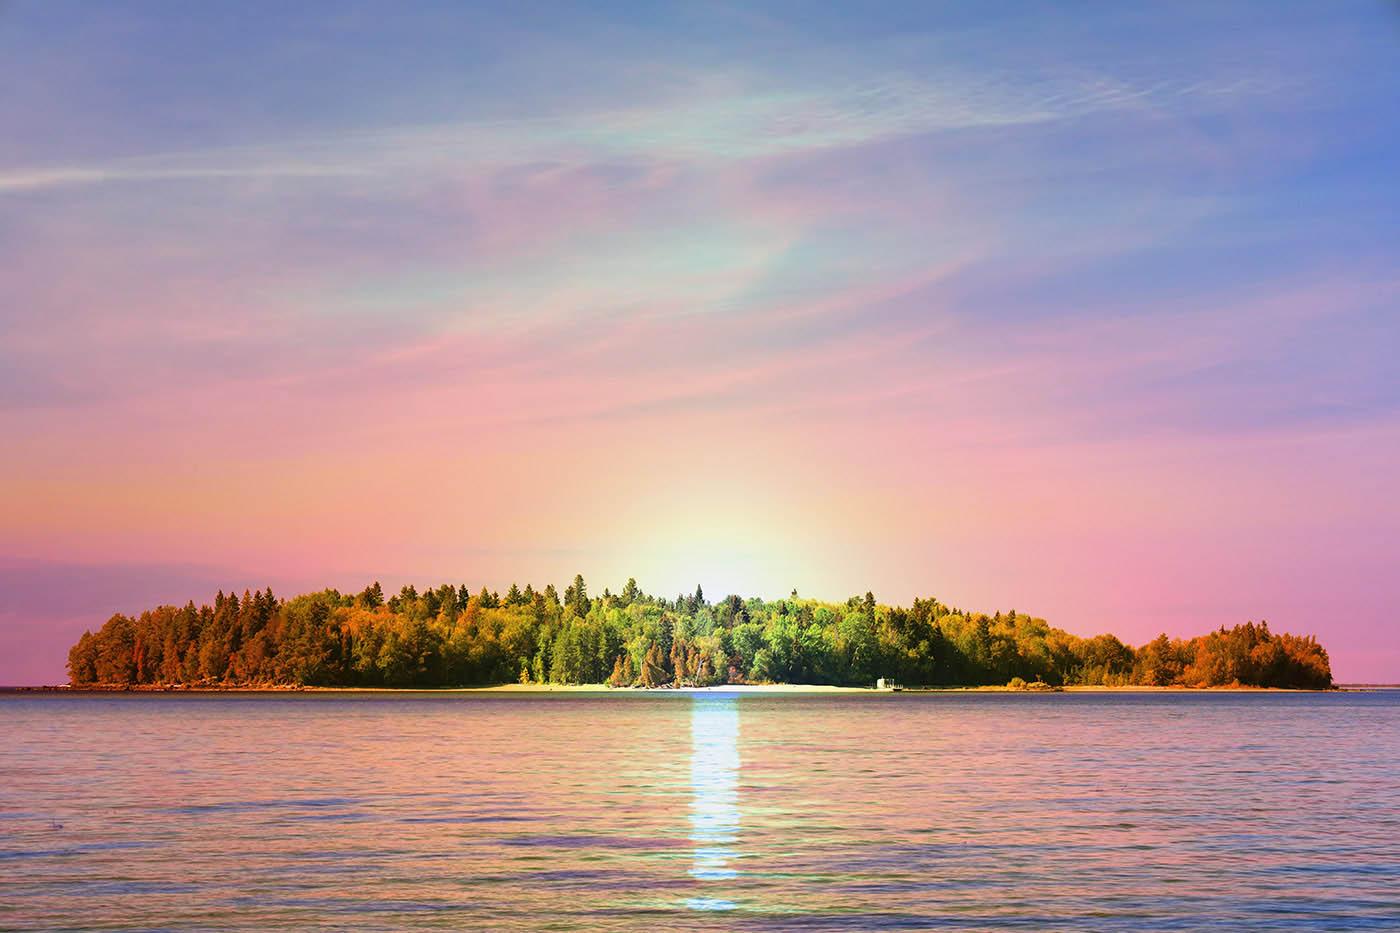 Peaceful Remote Island